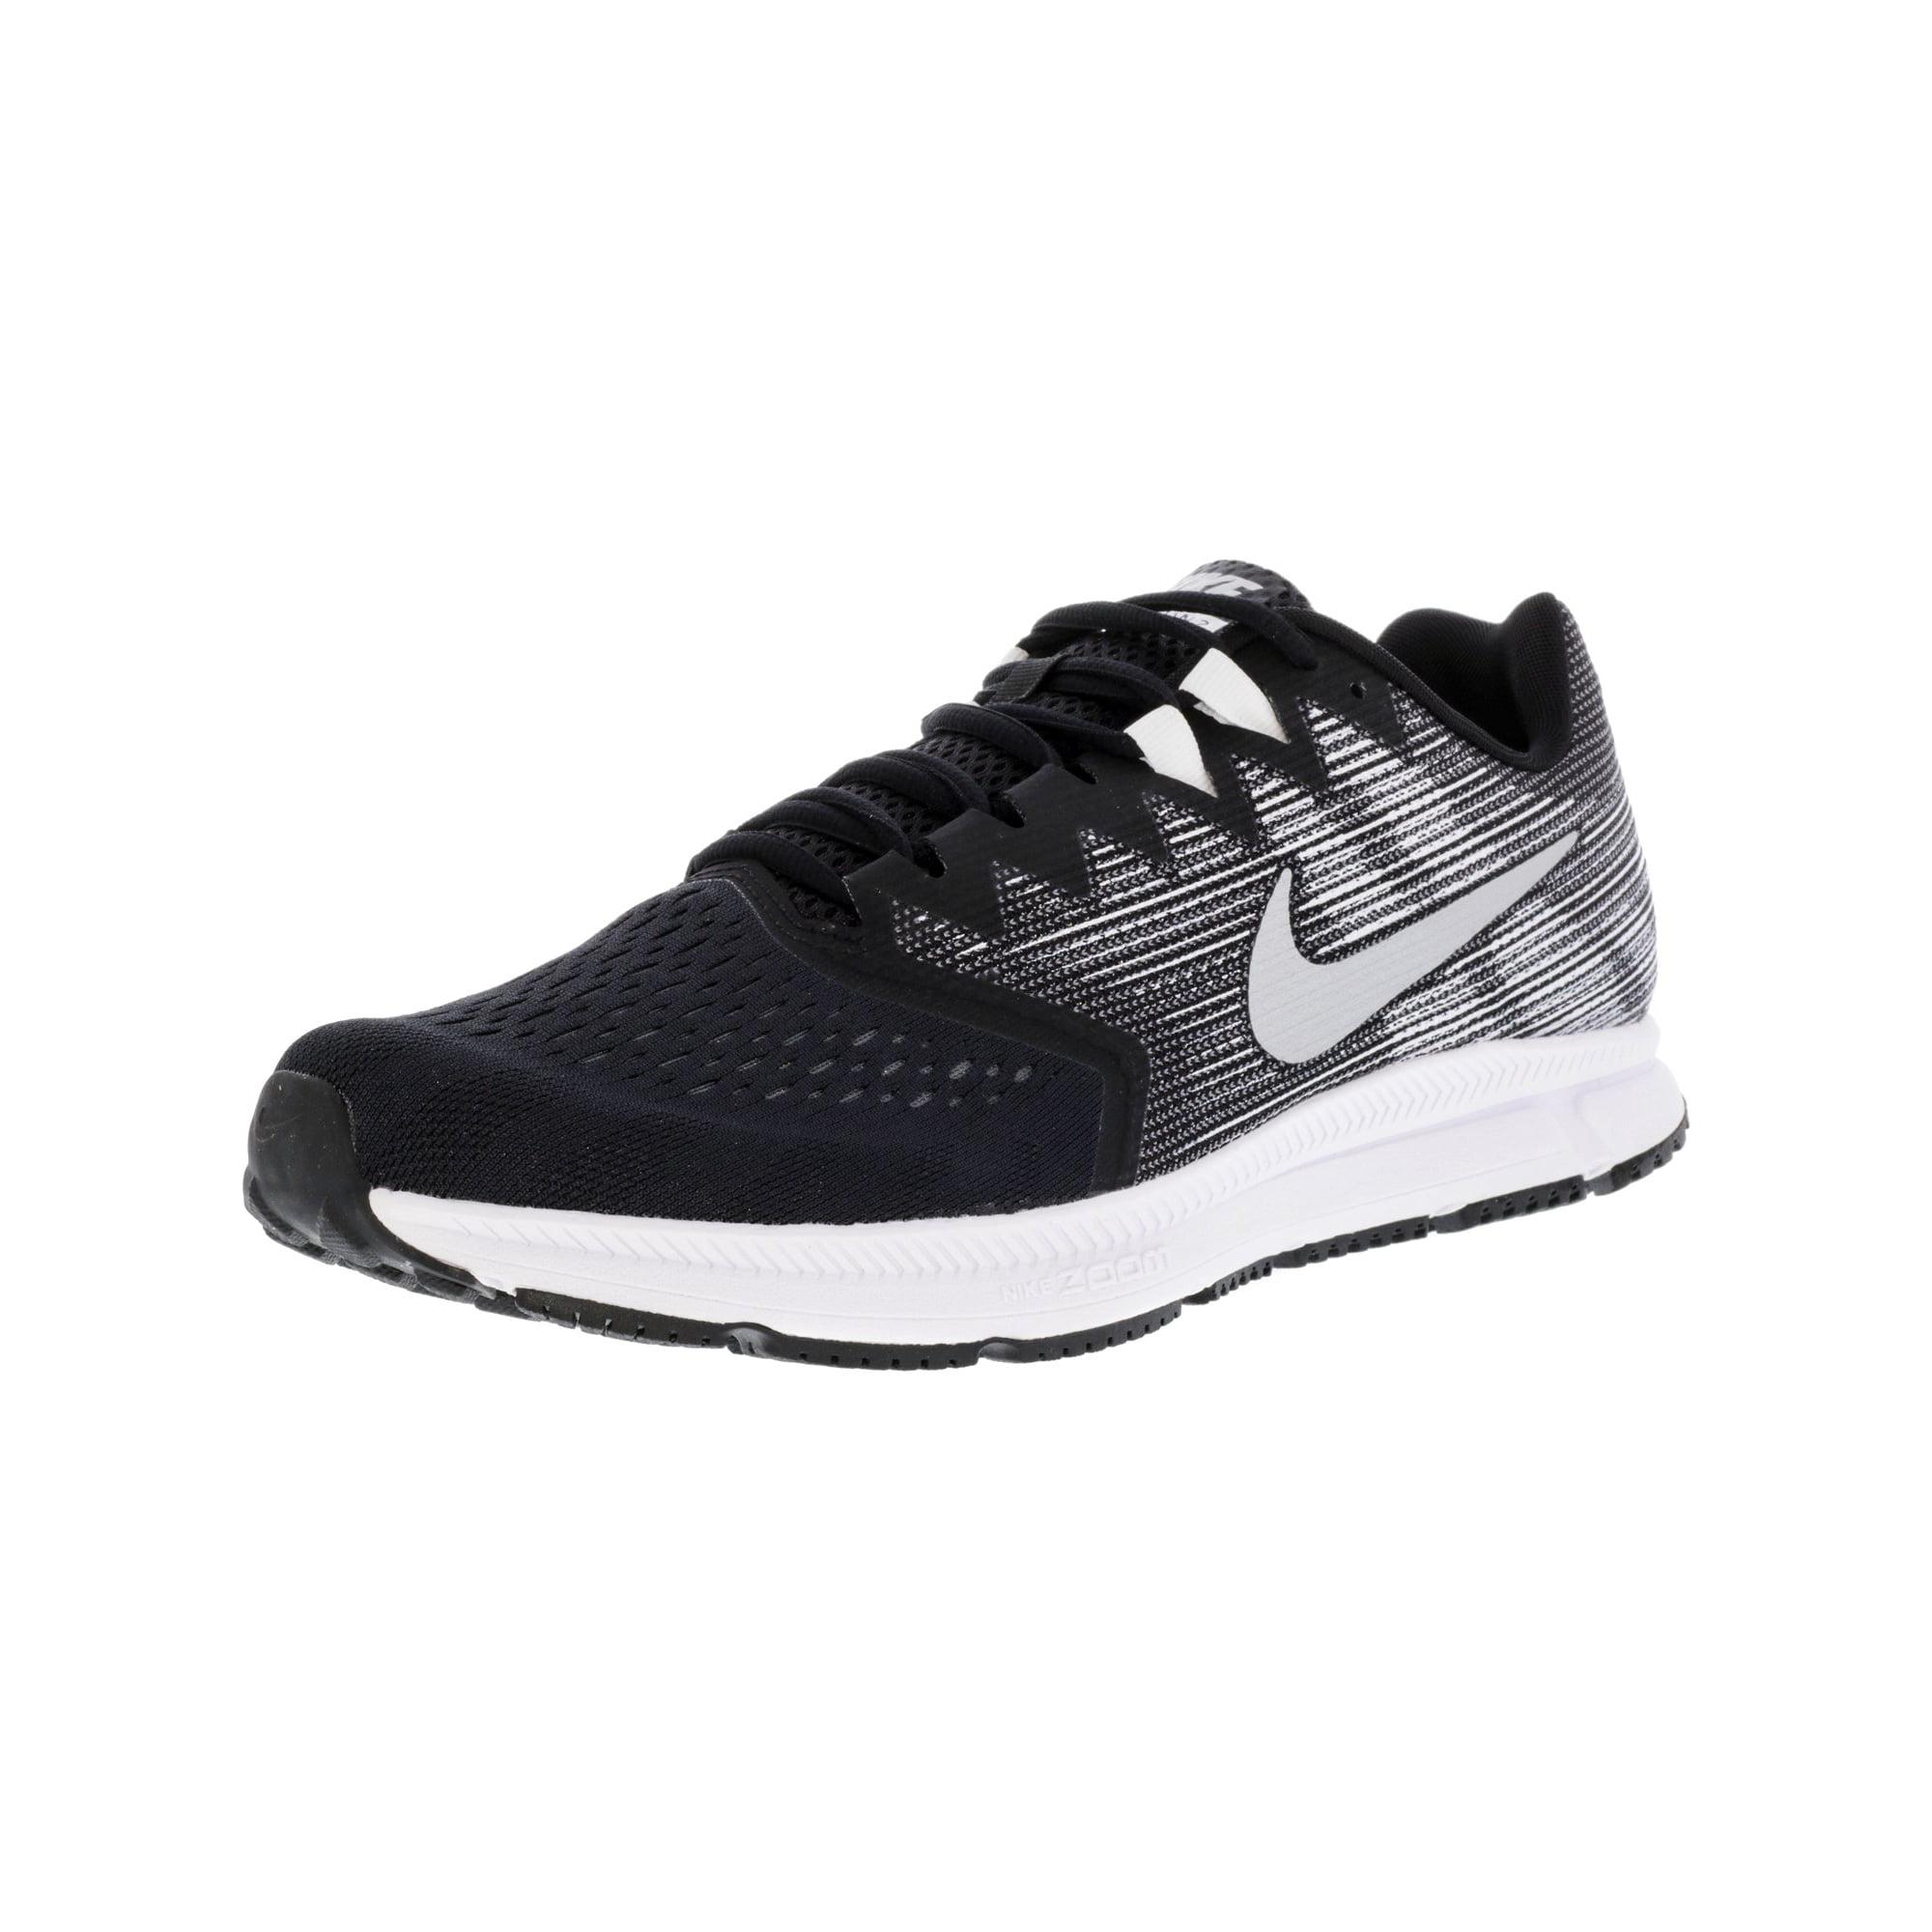 5366e4521745a Nike Men s Zoom Span 2 Gunsmoke   Total Crimson - Black Ankle-High Running  Shoe 9.5M